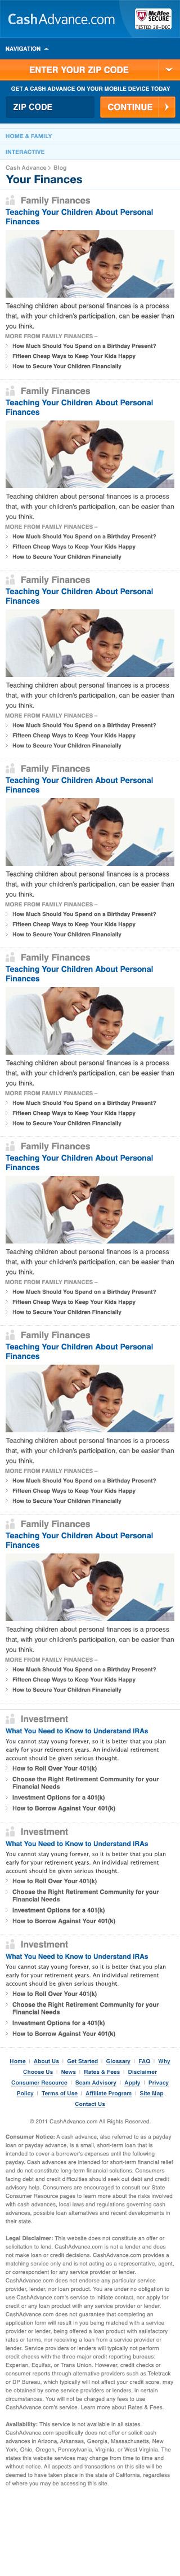 CashAdvance.com Finances Page